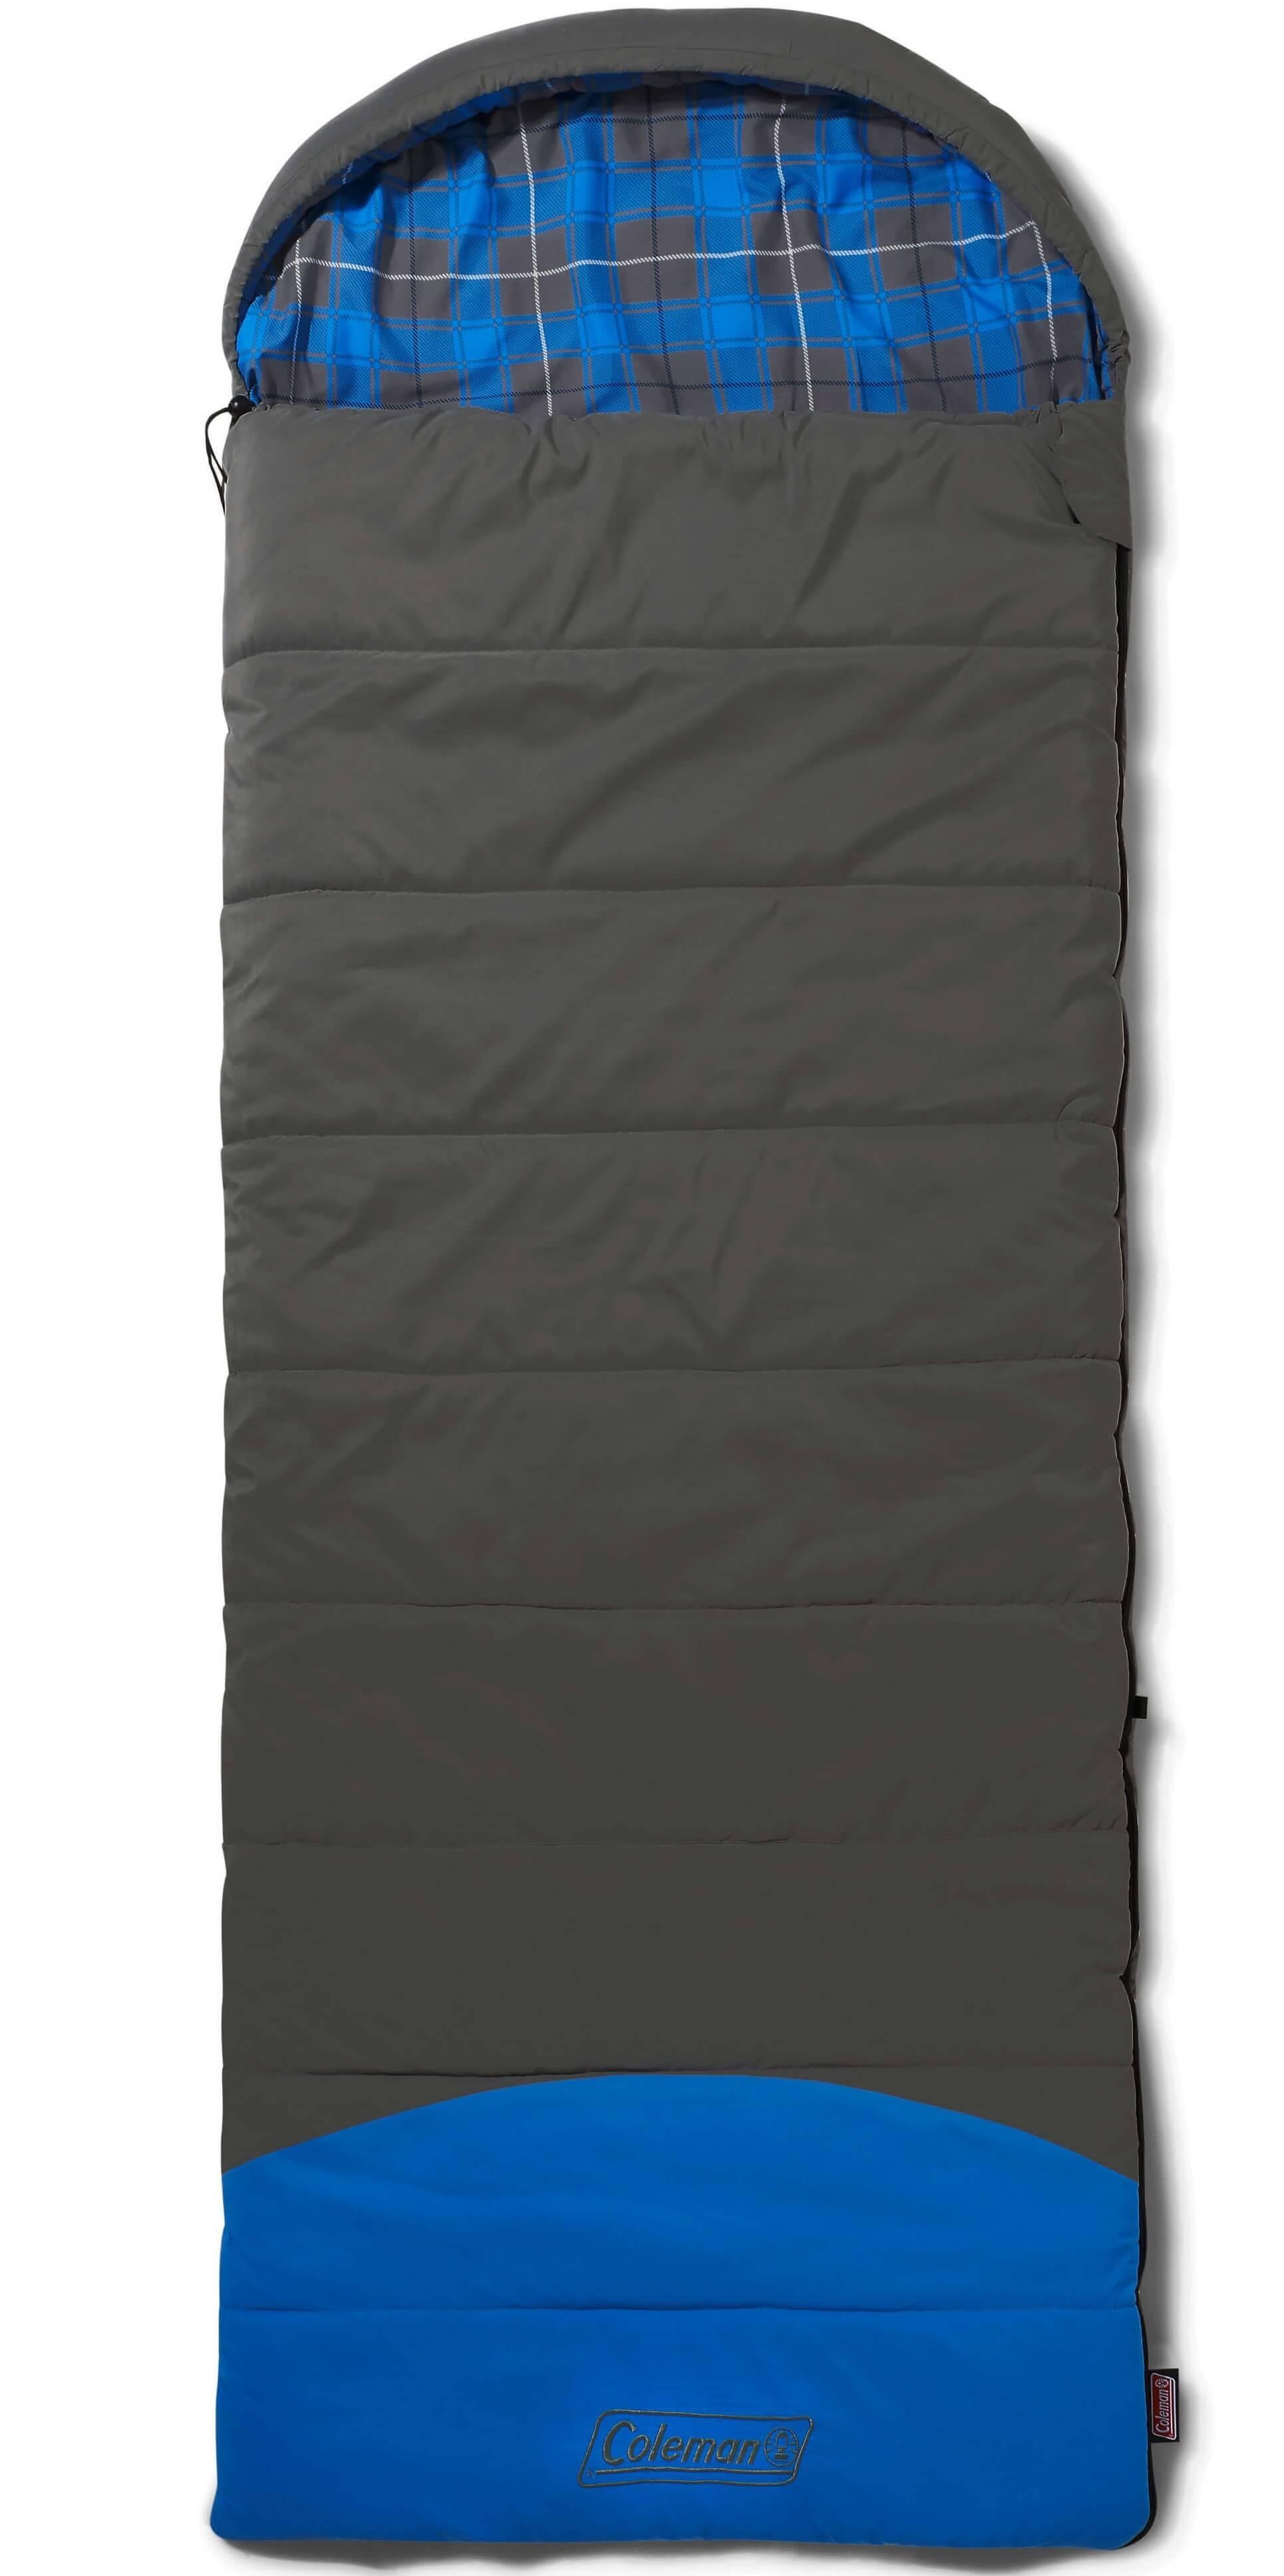 Image of   Coleman Basalt Single Sleeping Bag - Grey / Blå